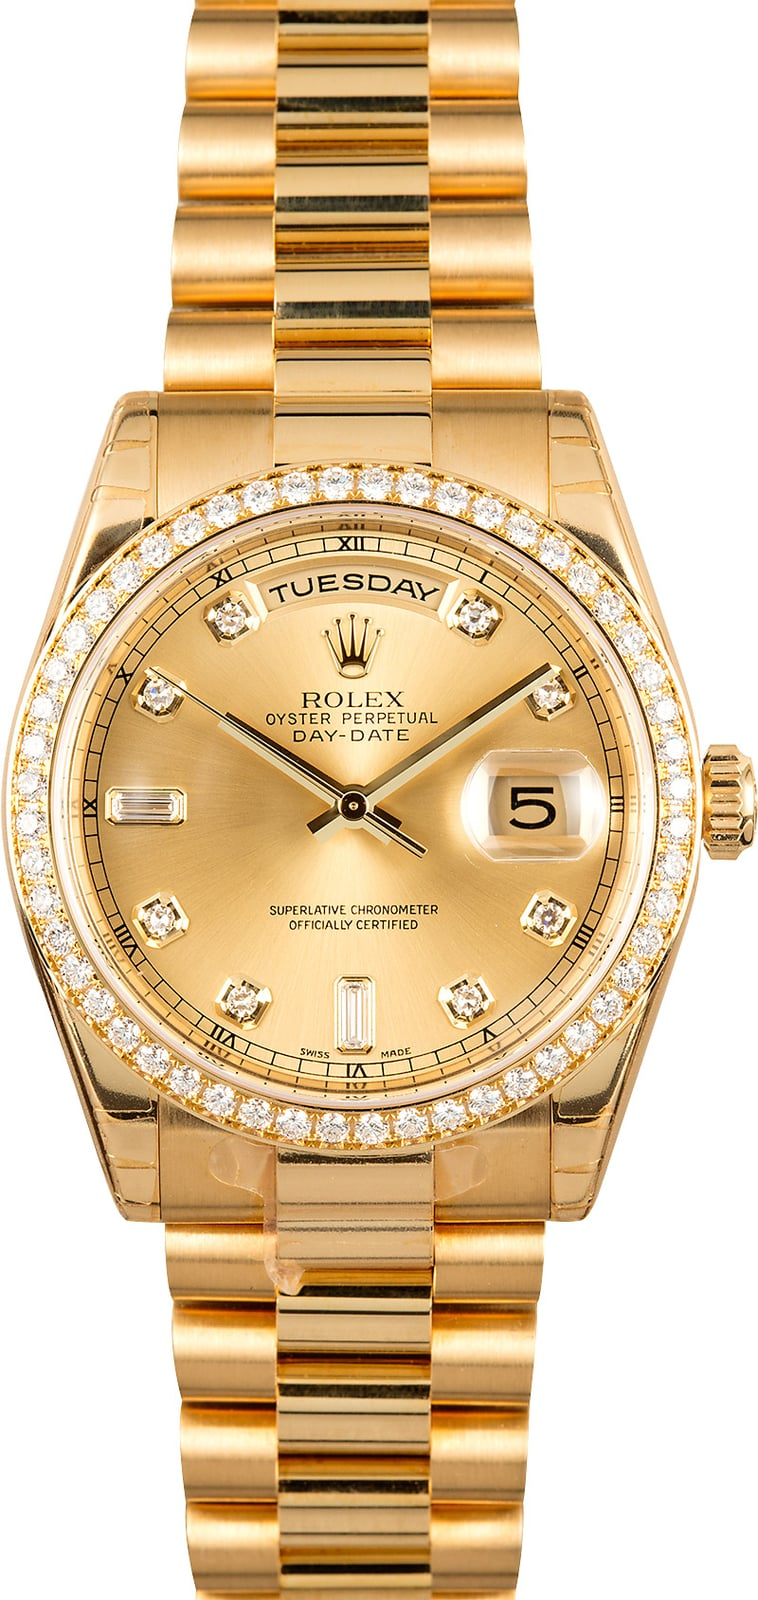 Rolex presidential day date in Sydney